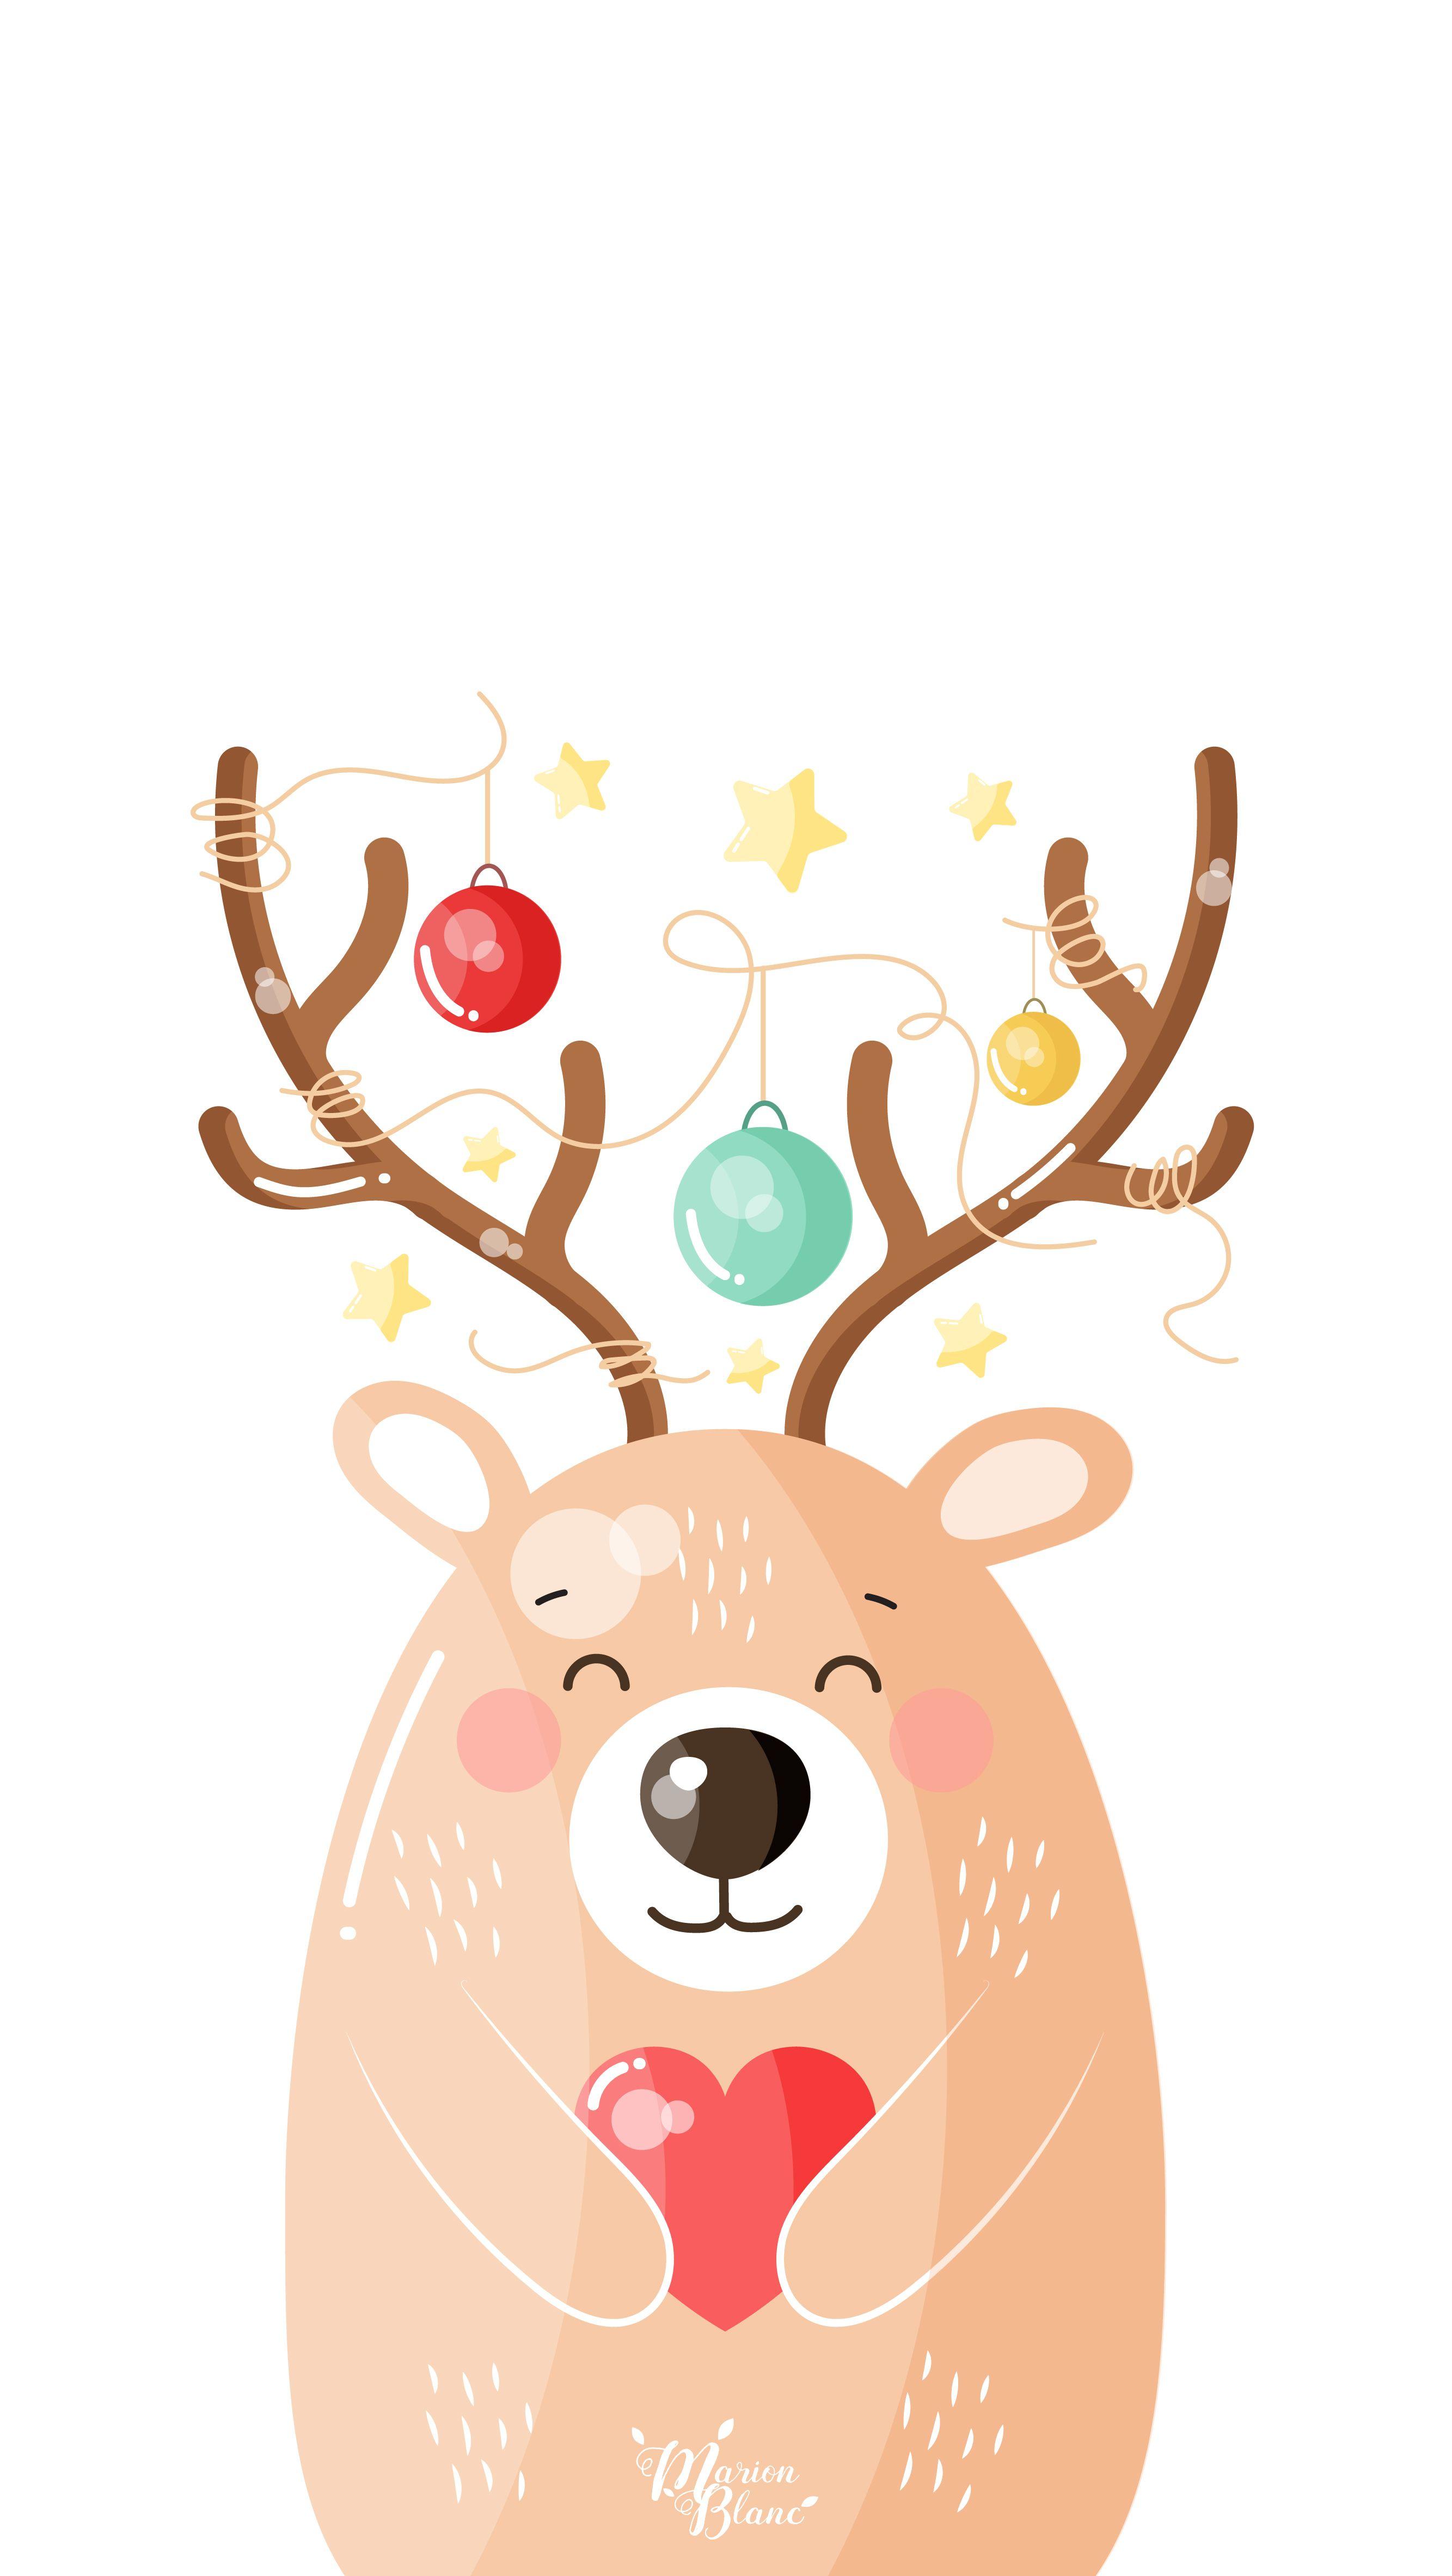 Bear Deer Marion Blanc Phone Wallpaper Pinterest Christmas